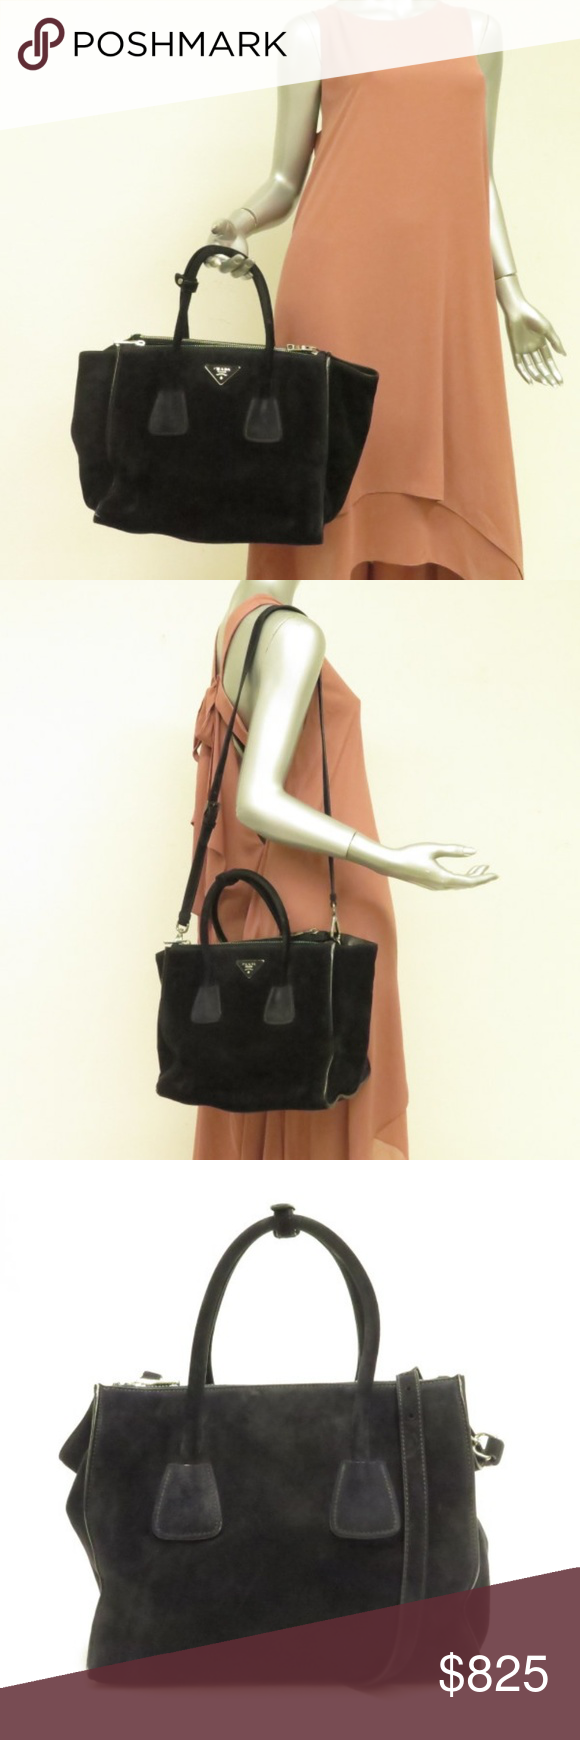 bf4ddb34a4d4 Prada Twin Pocket Tote Bag Black Suede ITEM: Prada Twin Pocket Tote Bag  Black Suede